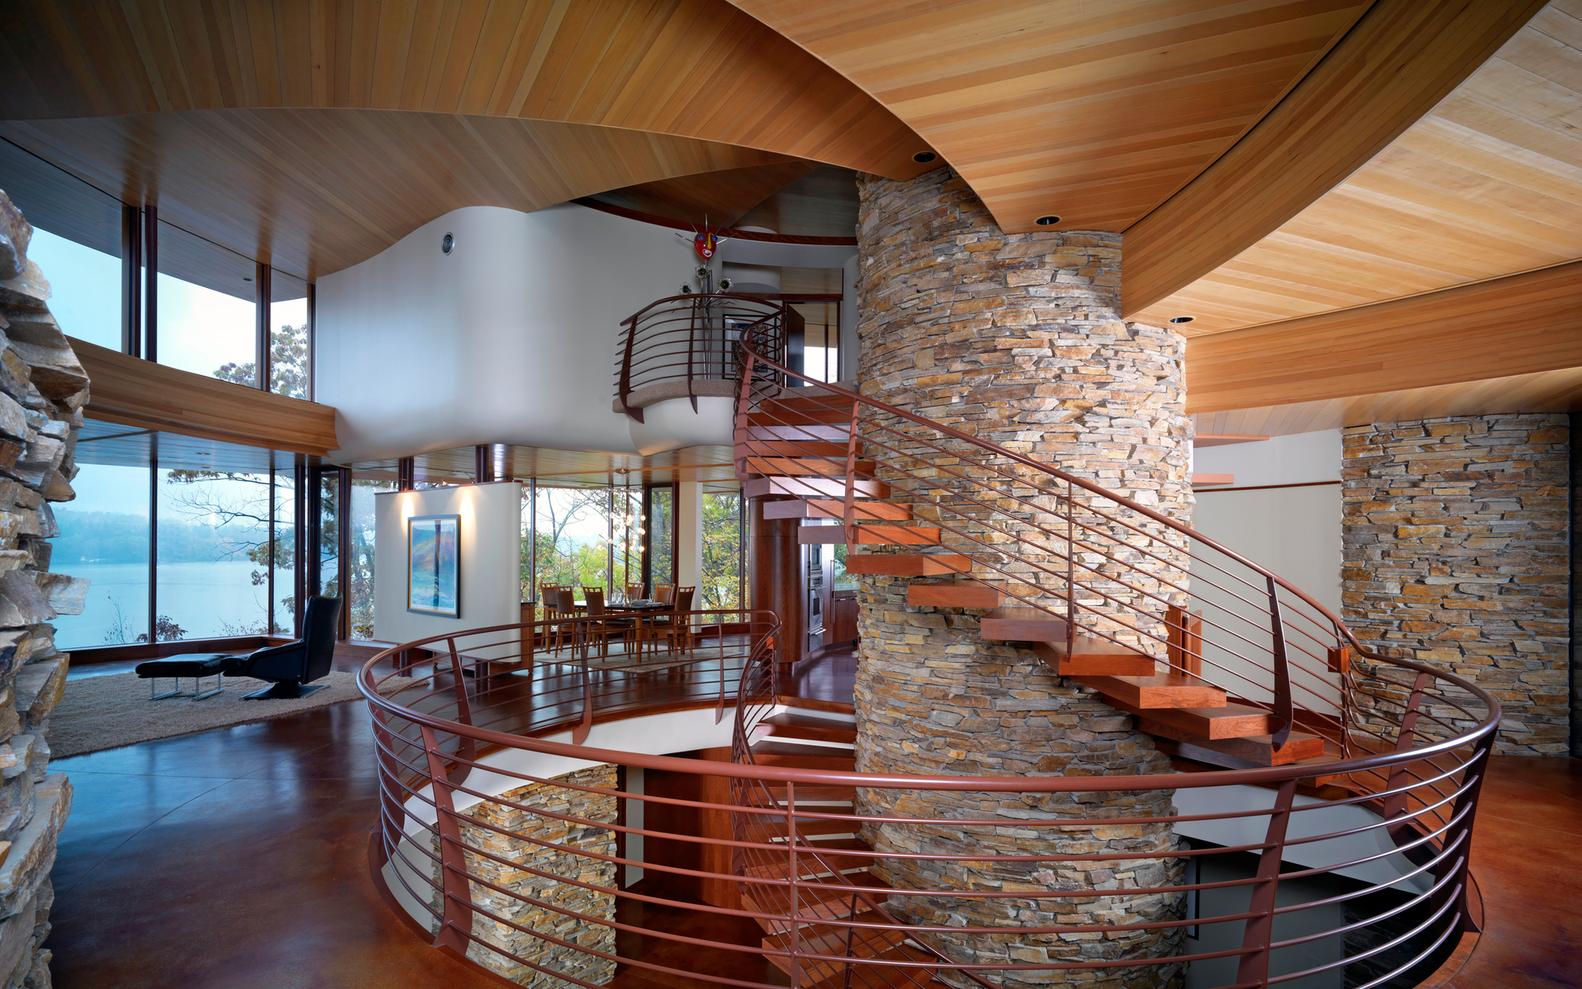 gallery of chenequa residence  robert harvey oshatz architect   -